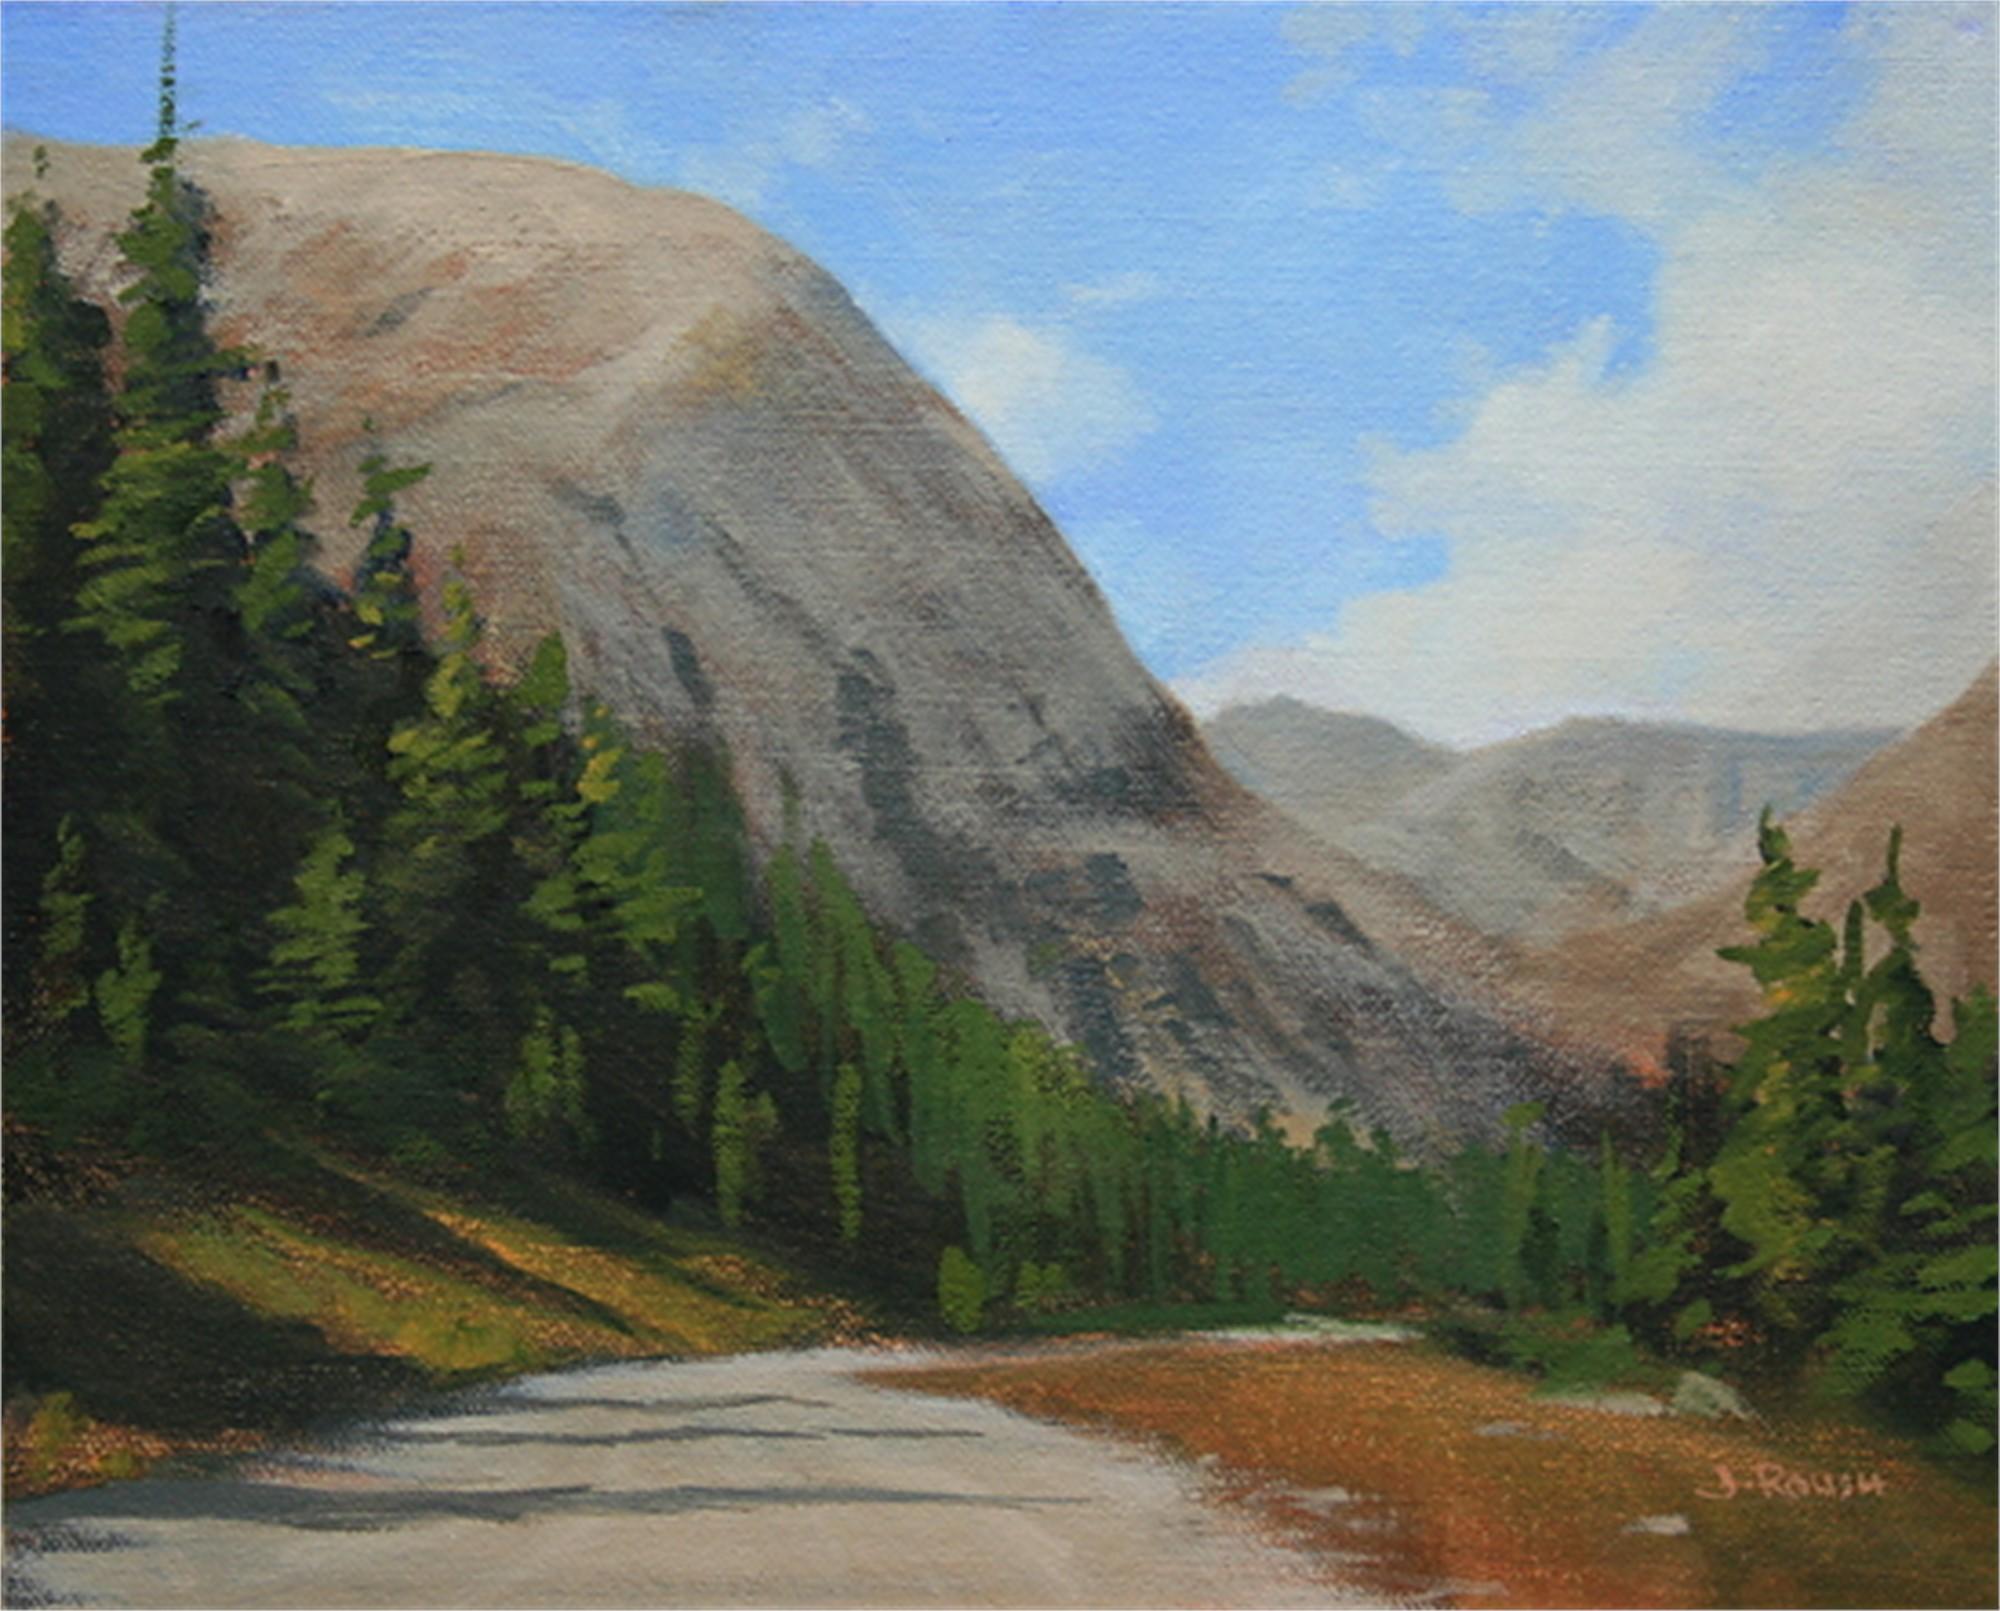 High Road by John Roush